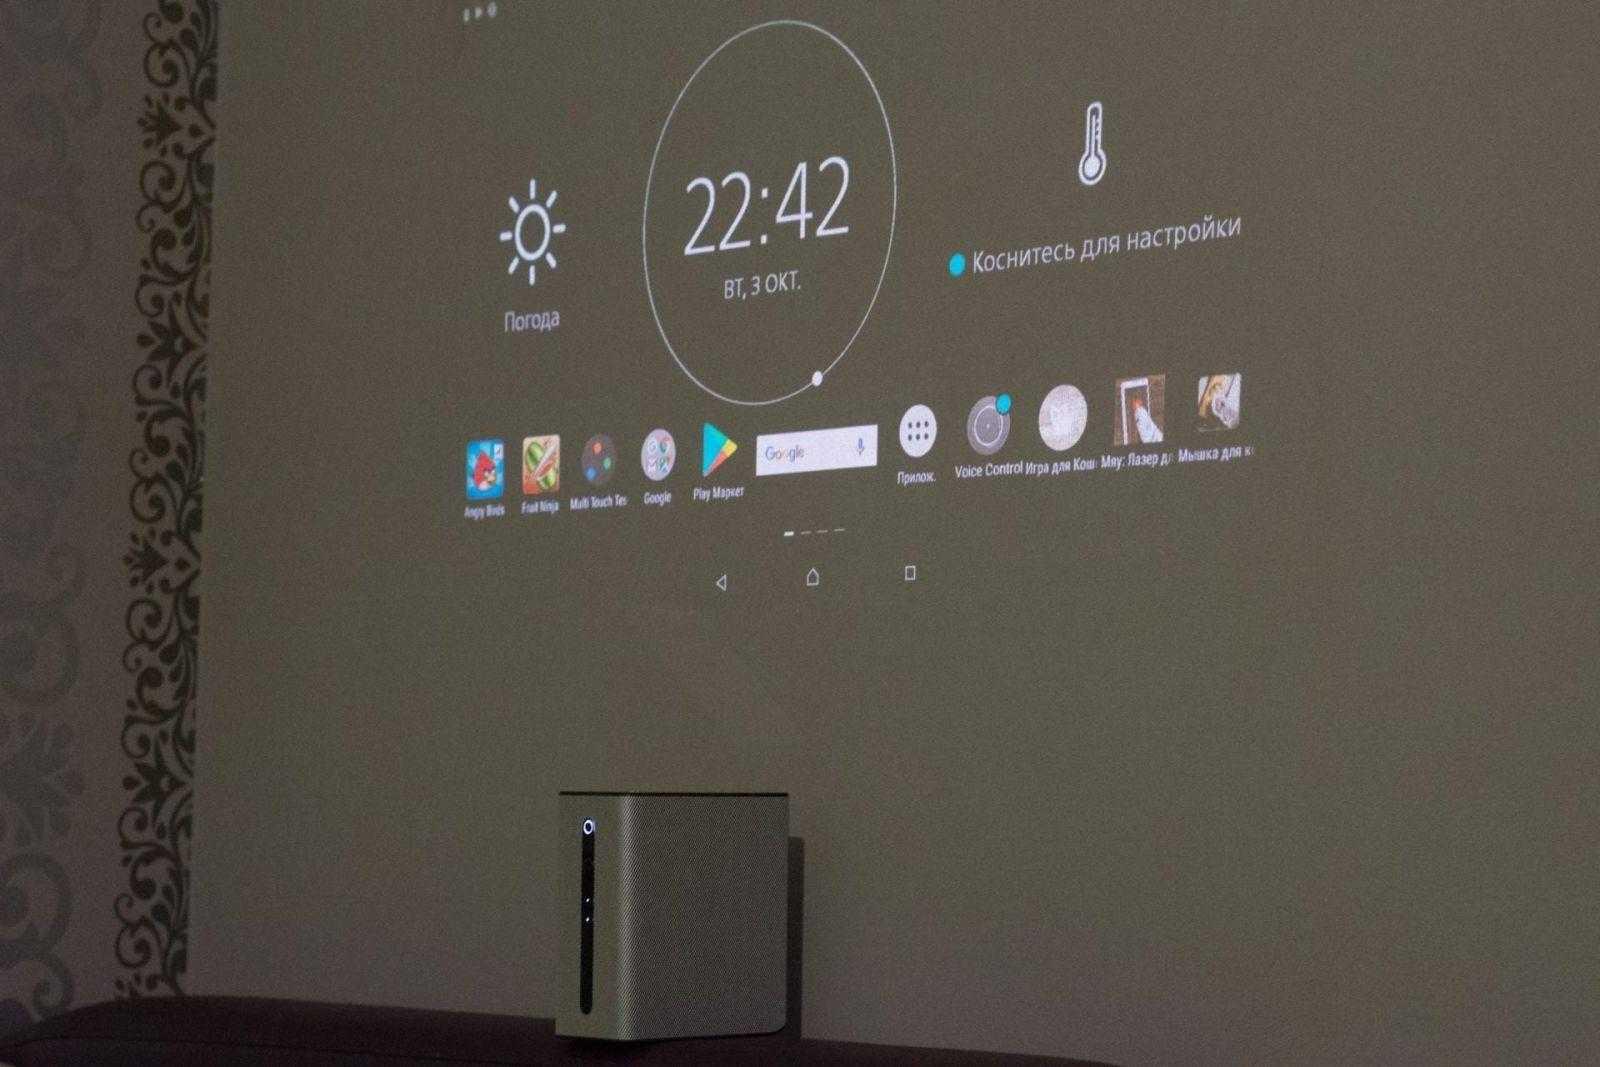 DSC 5983 - Обзор проектора Sony Xperia Touch. Потрогай виртуальность